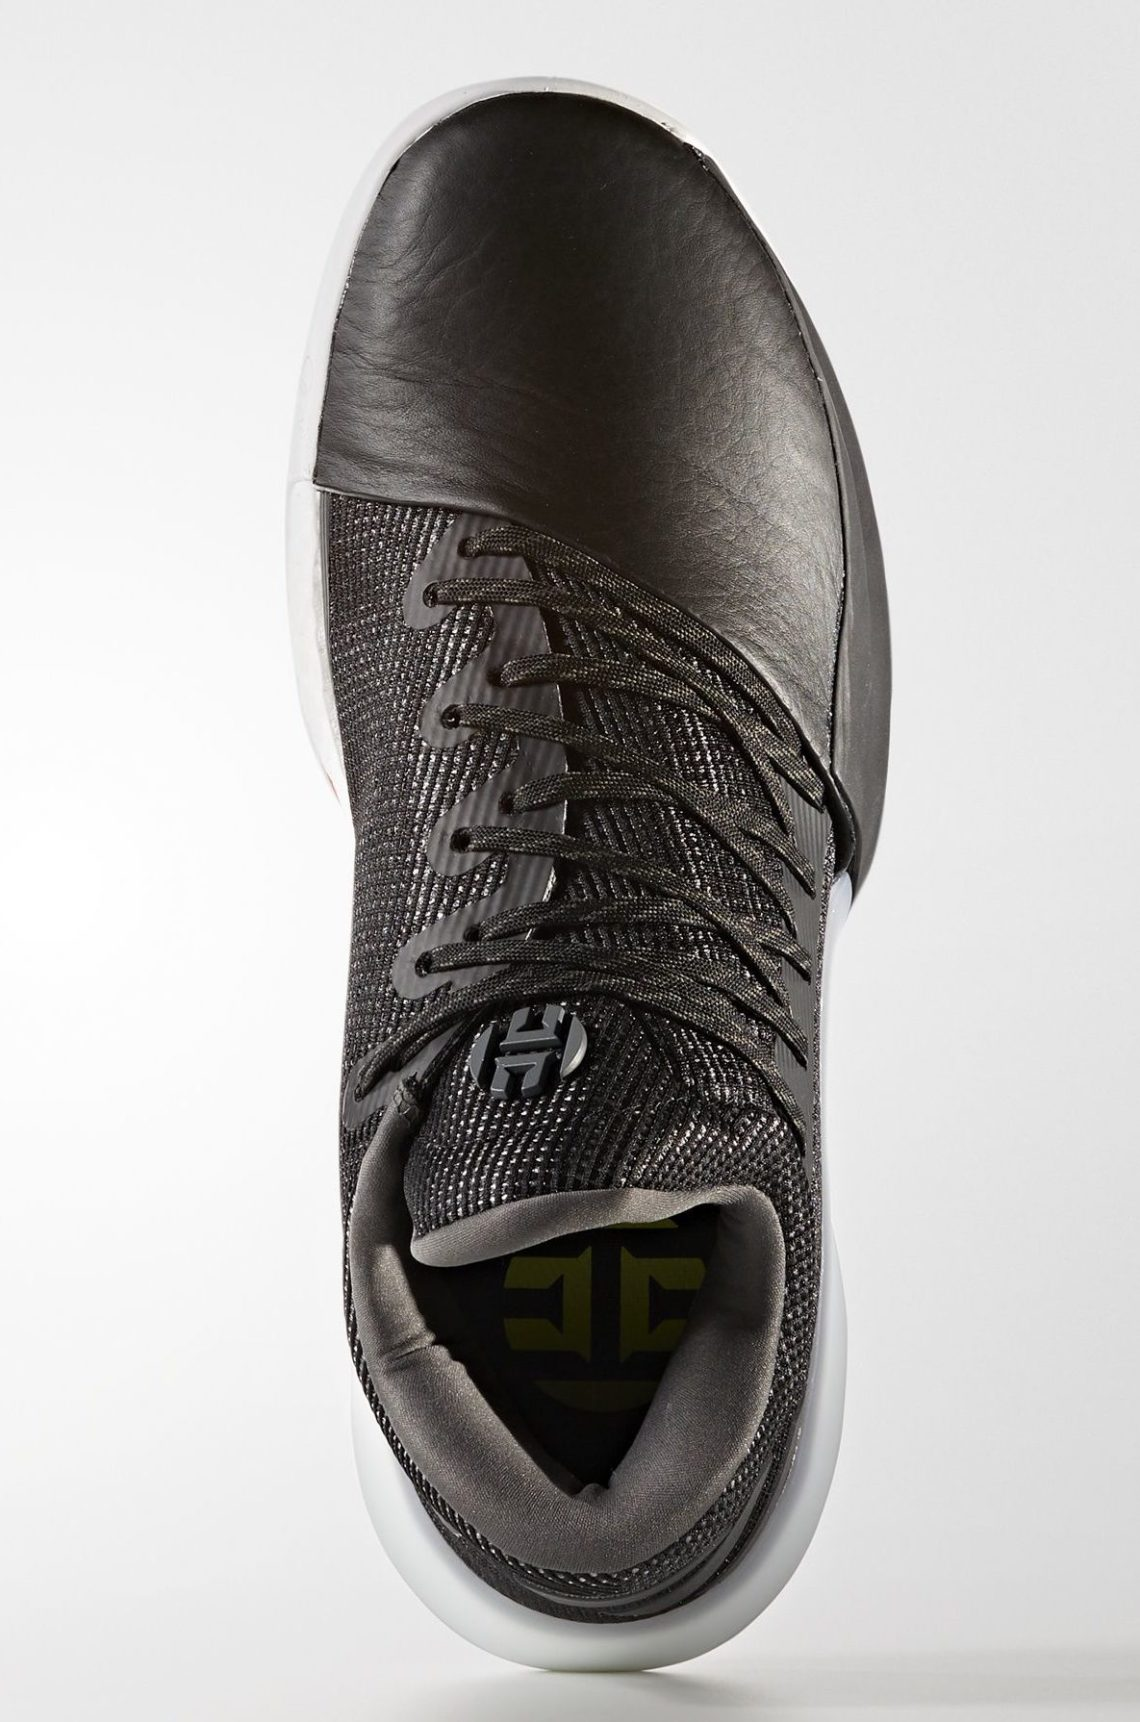 073d693748ea adidas Harden Vol 1 Releasing in Another Colorway